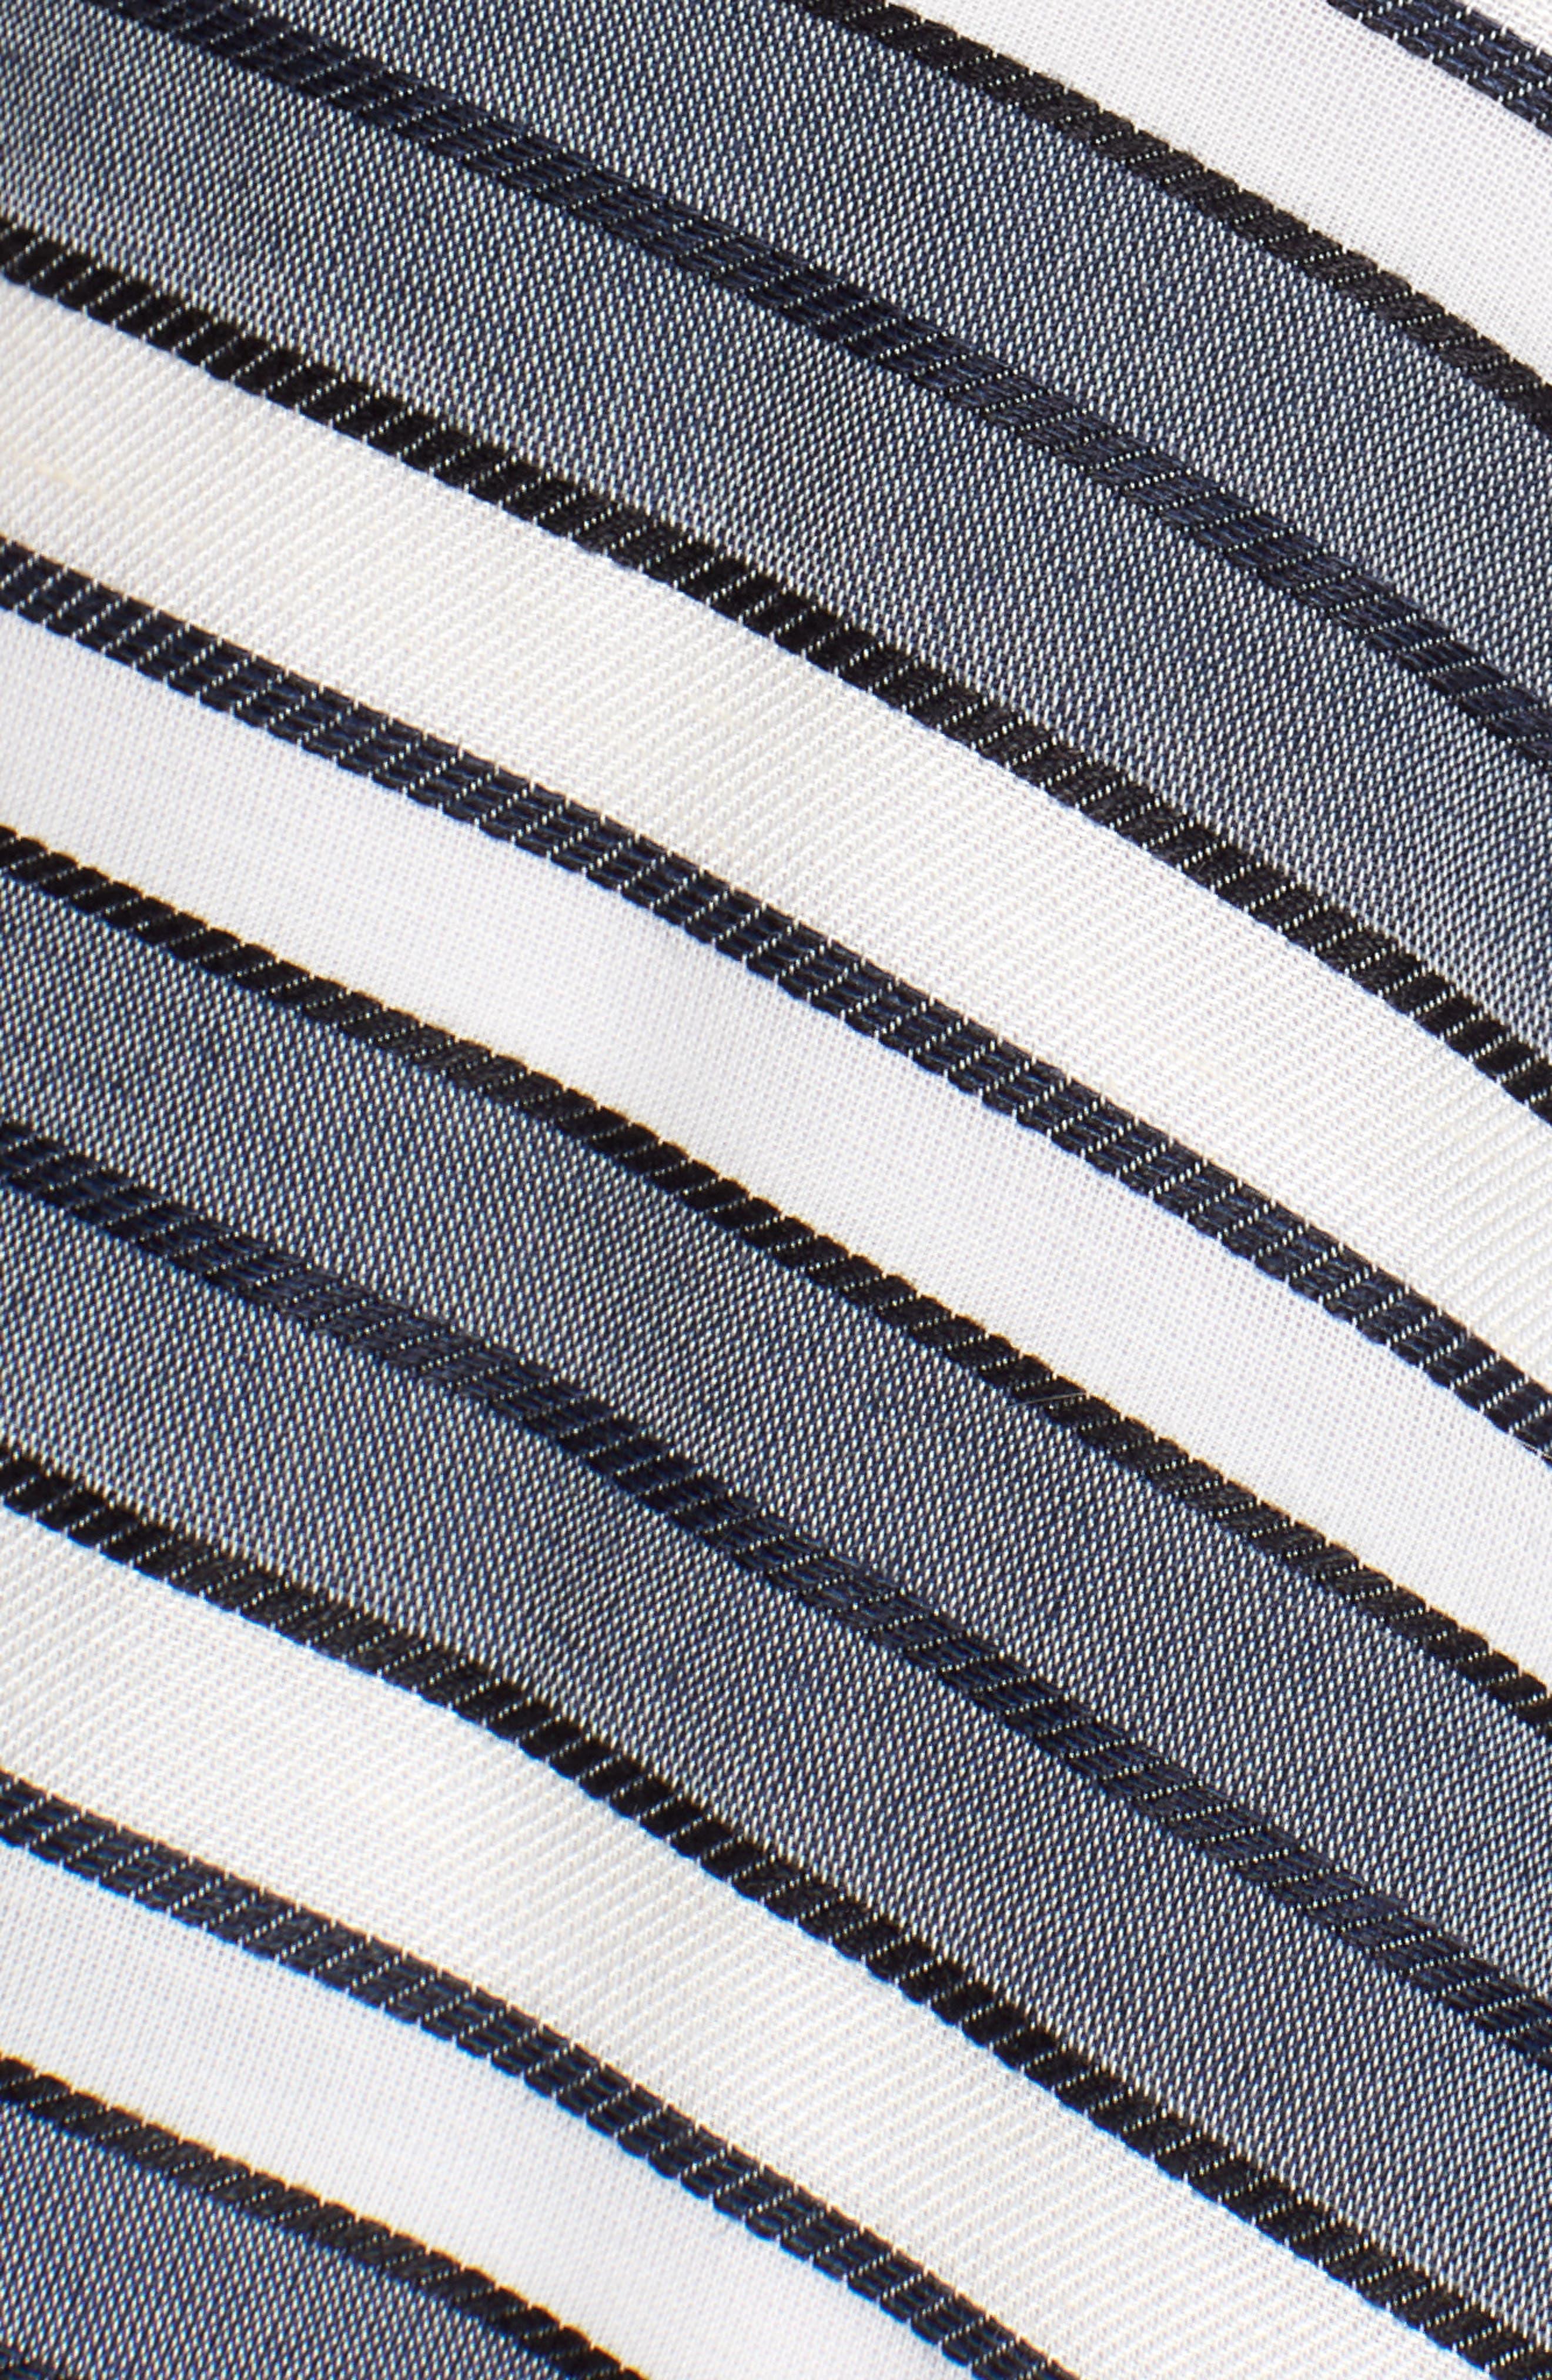 Stripe V-Neck Dress,                             Alternate thumbnail 6, color,                             Navy Stripe